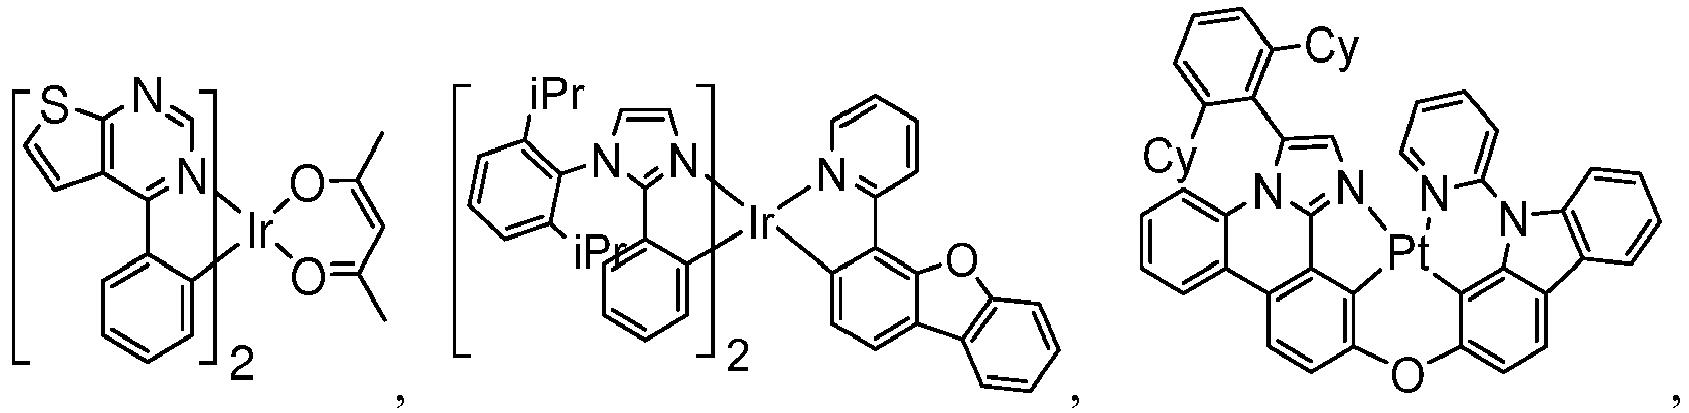 Figure imgb0917